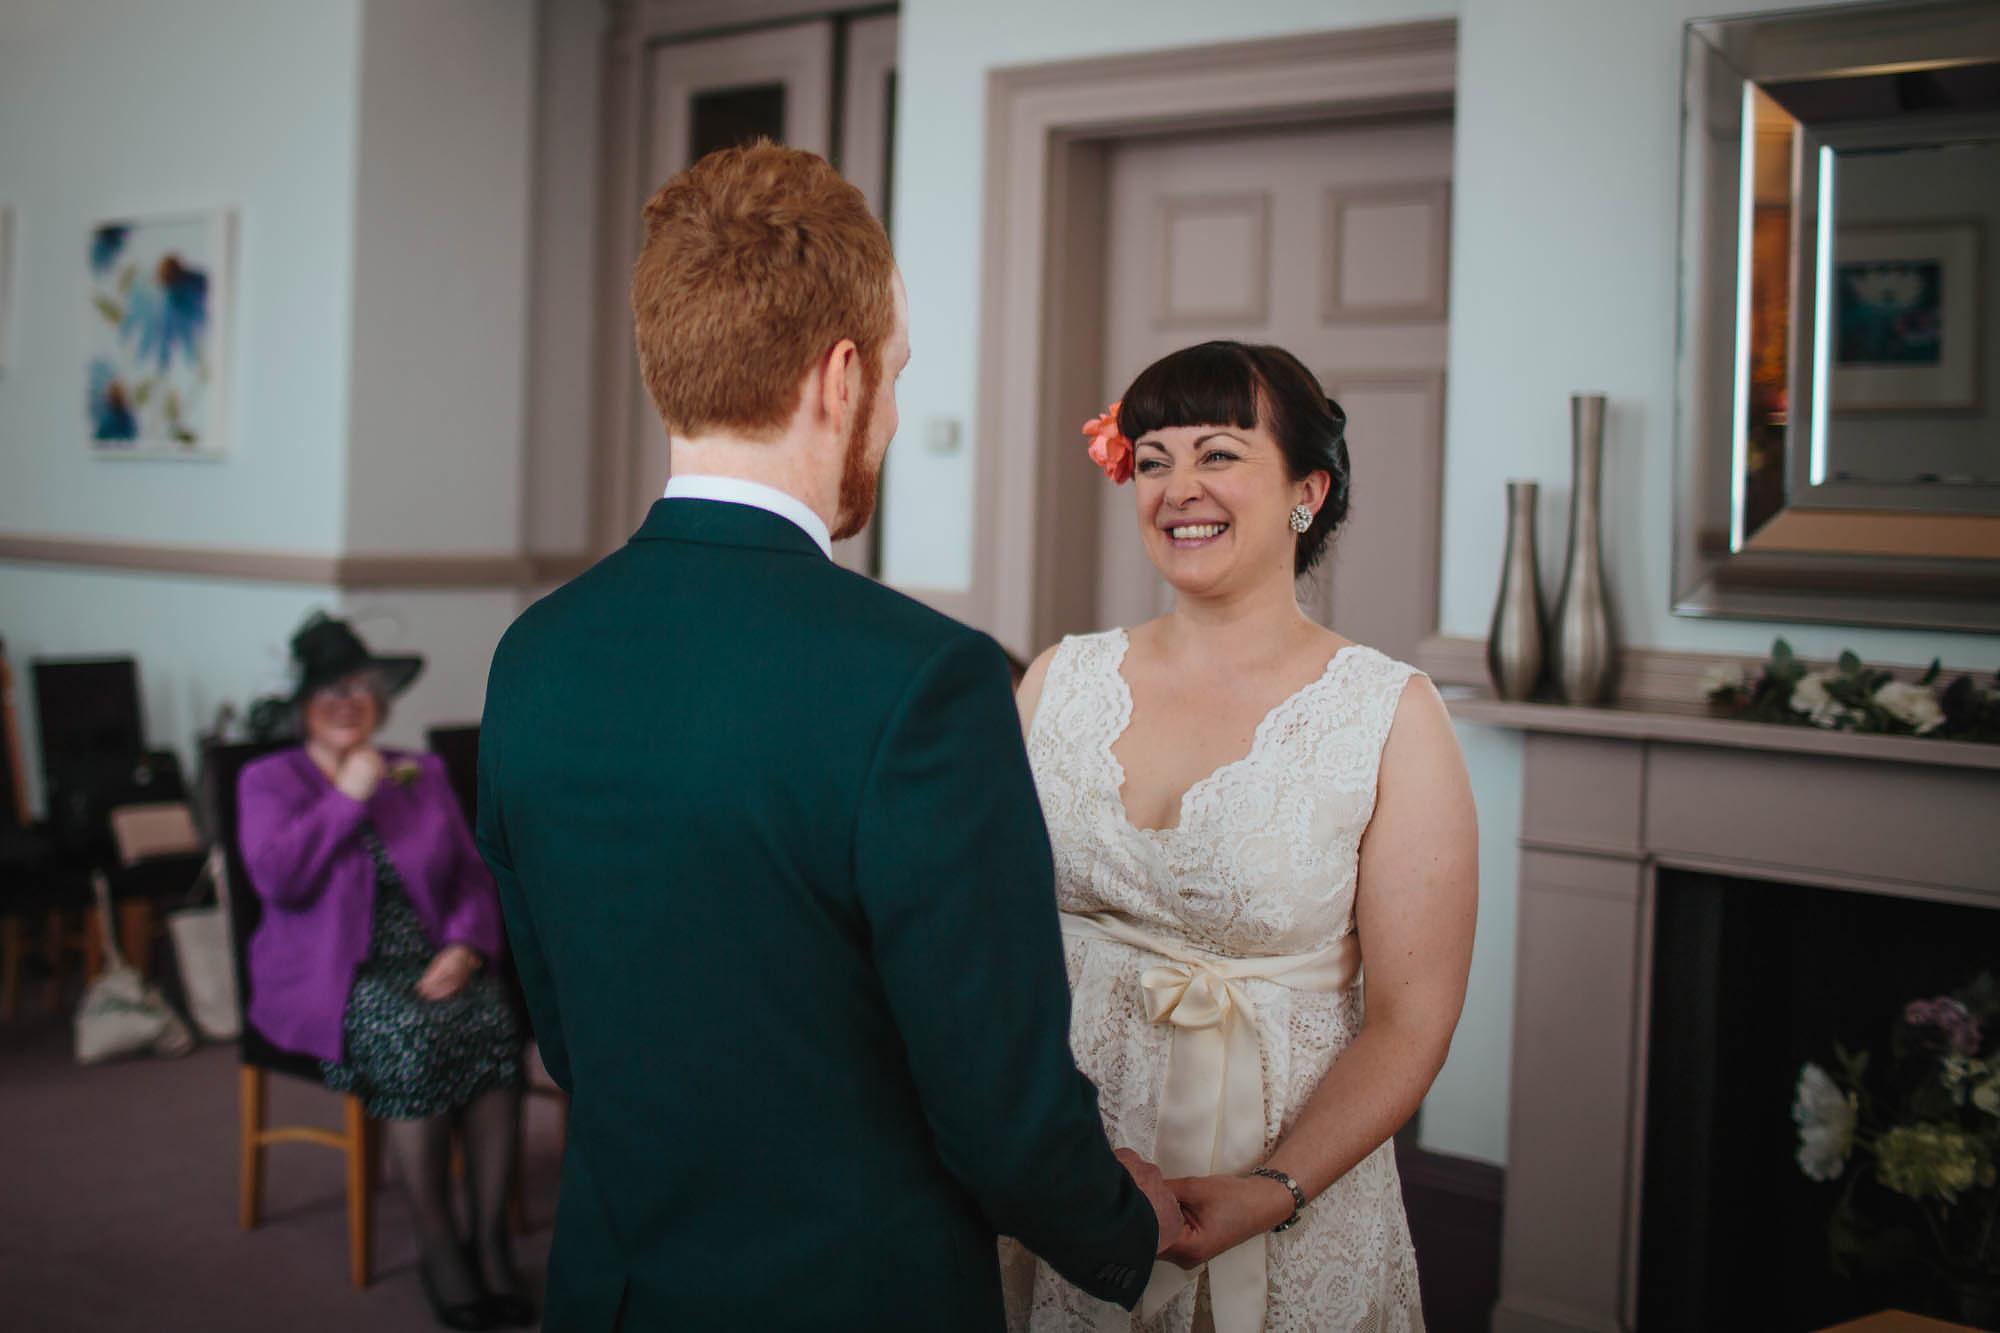 Leeds Yorkshire Wedding Photographer Ceremony Town Hall Bride Groom